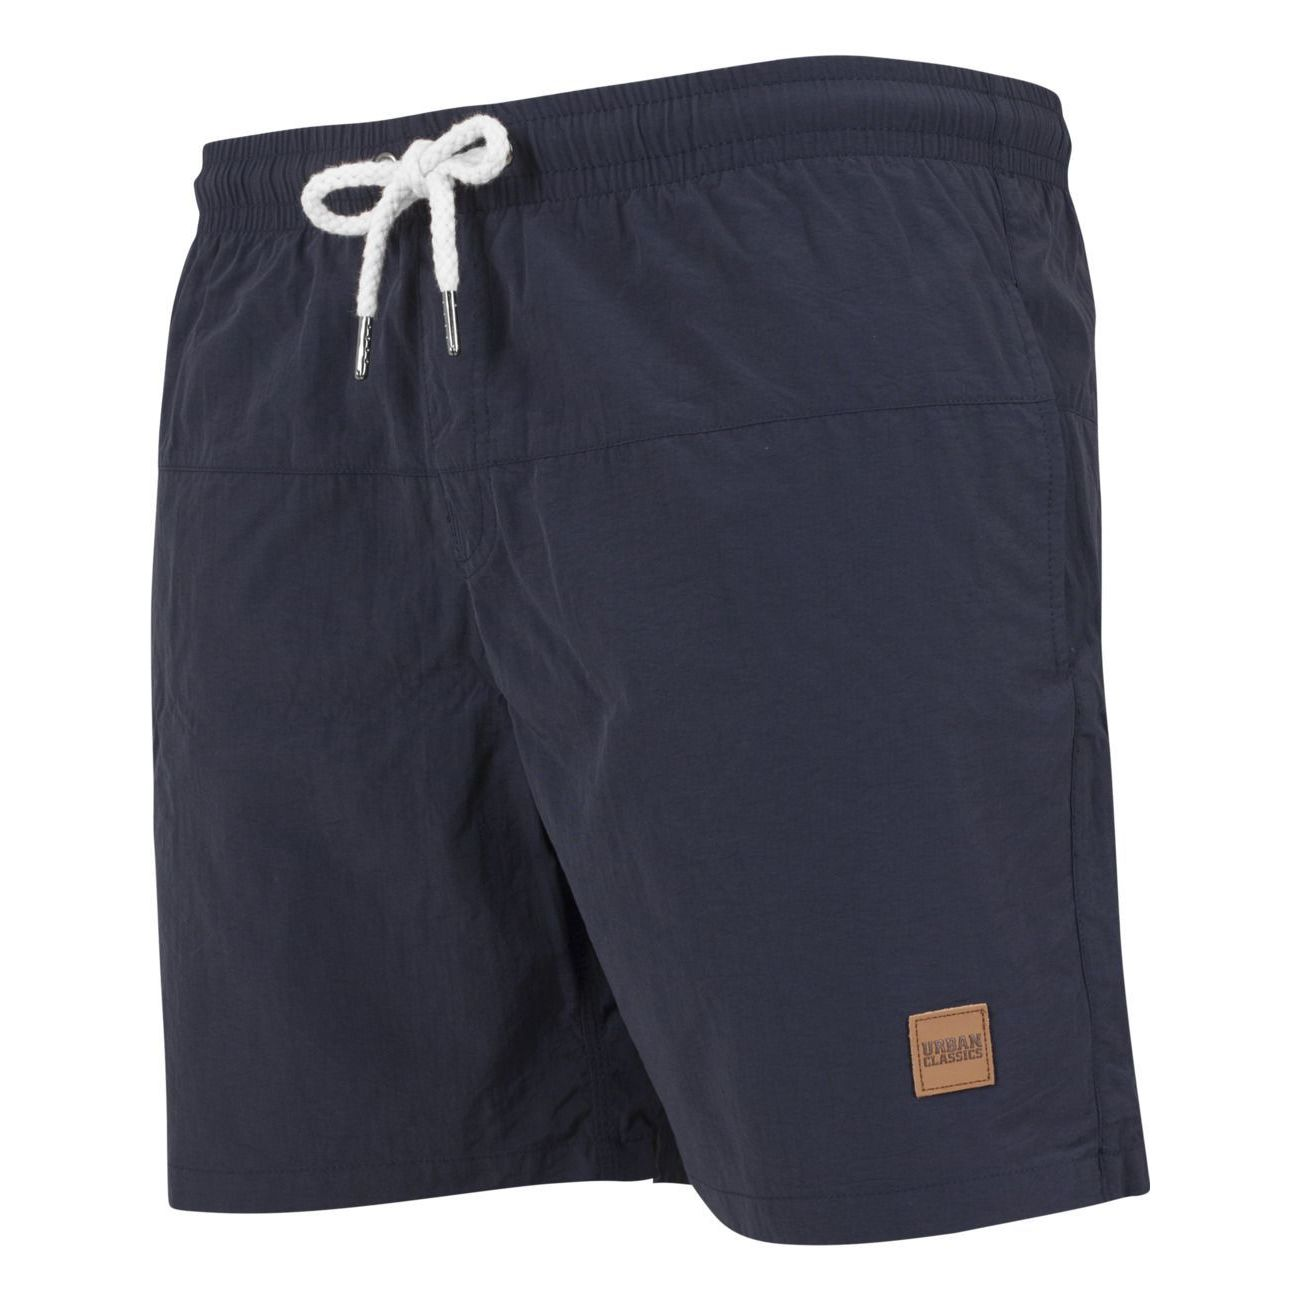 Short Urban Block Bain ModeLifestyle Classics Adulte De Swim bYf67gy